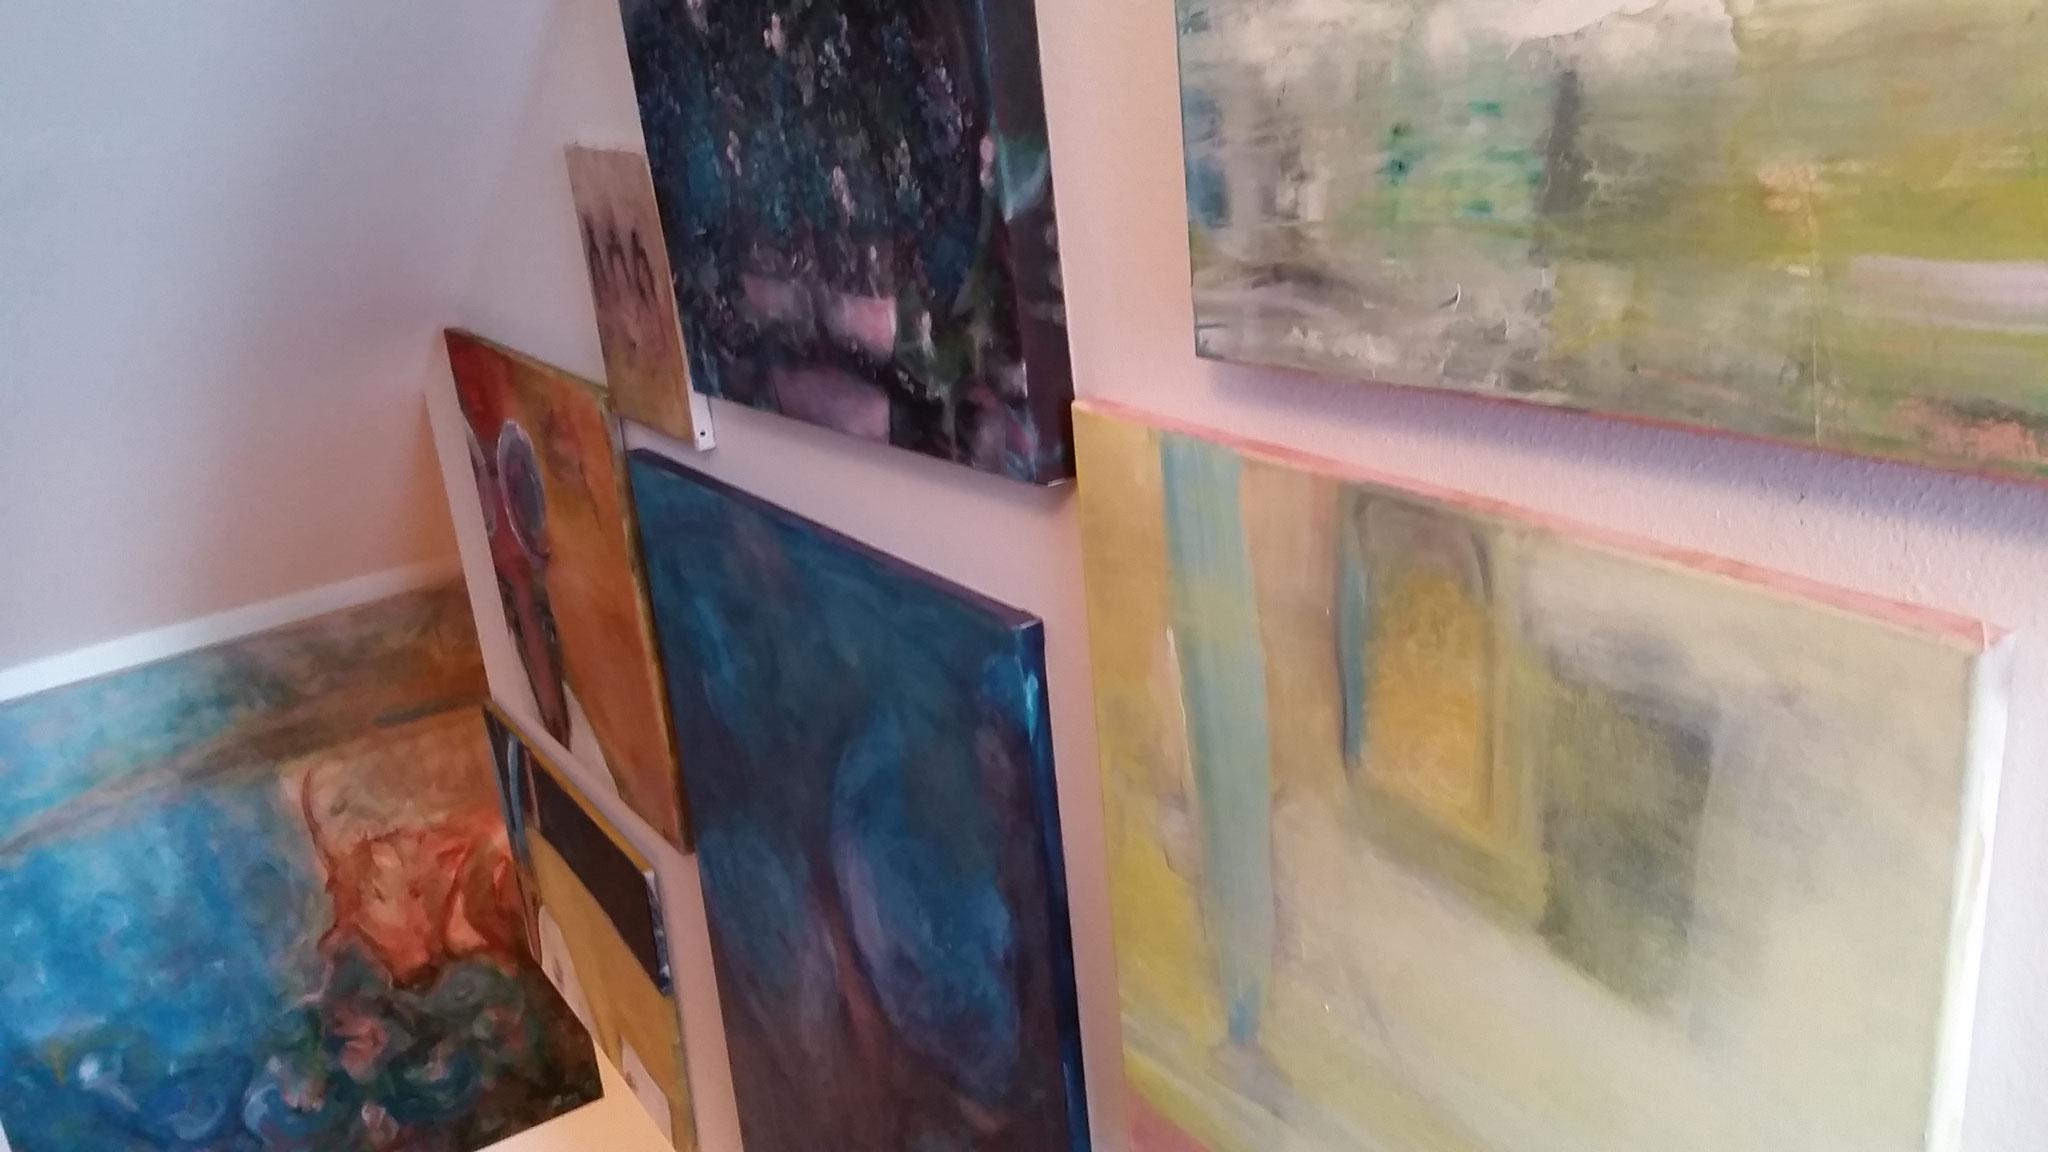 Treppen-Galerie 2, Maler Künstlerin Bozana